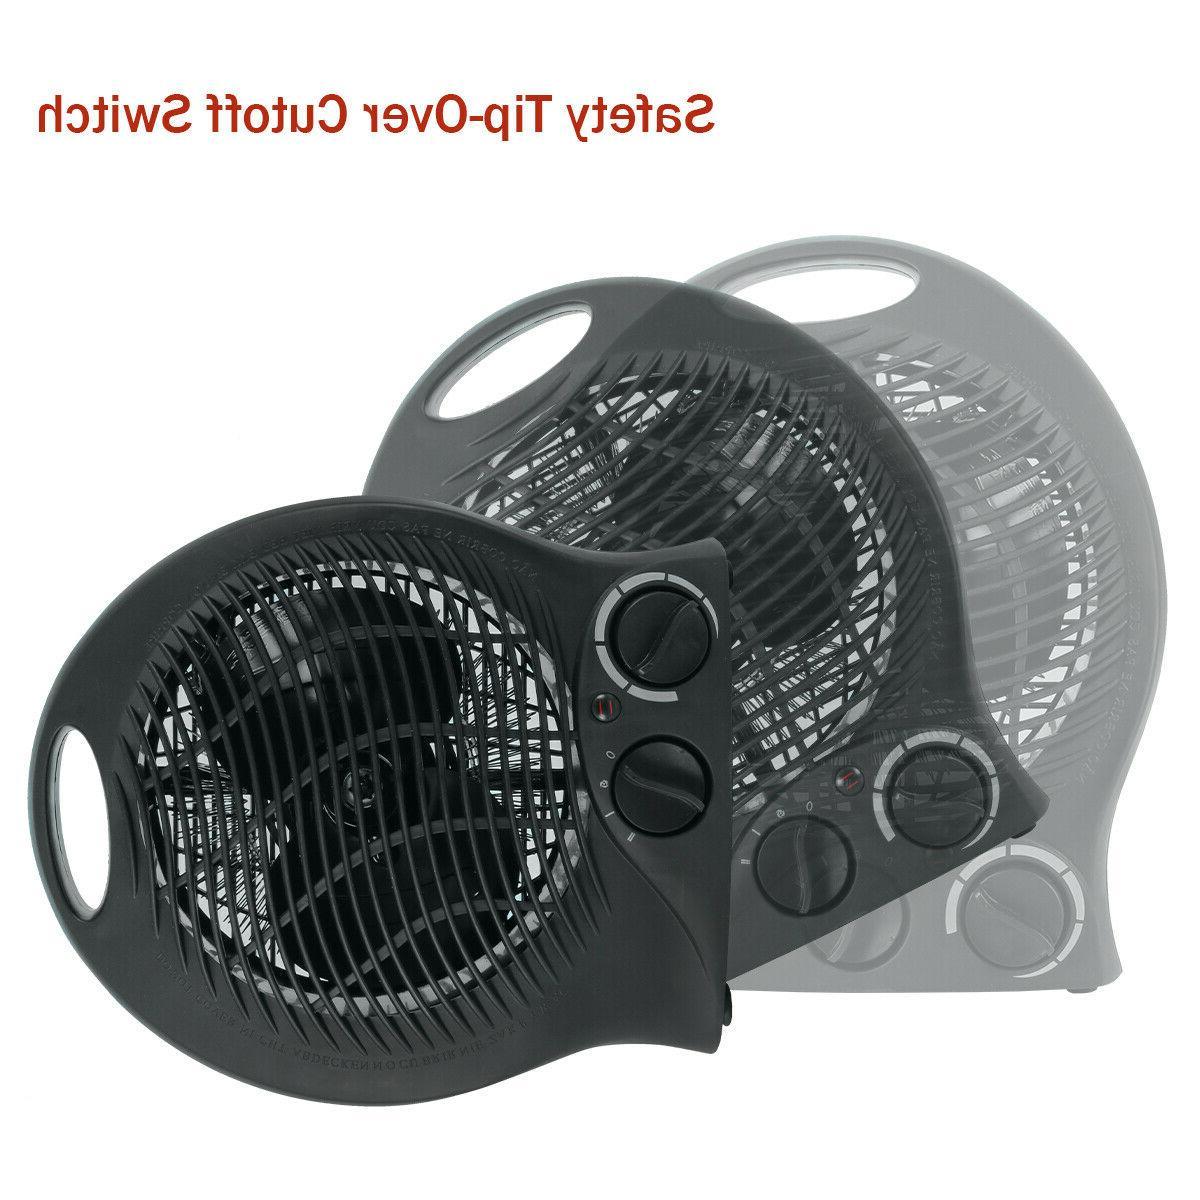 Portable Electric Space Heater 3 Settings Fan Forced